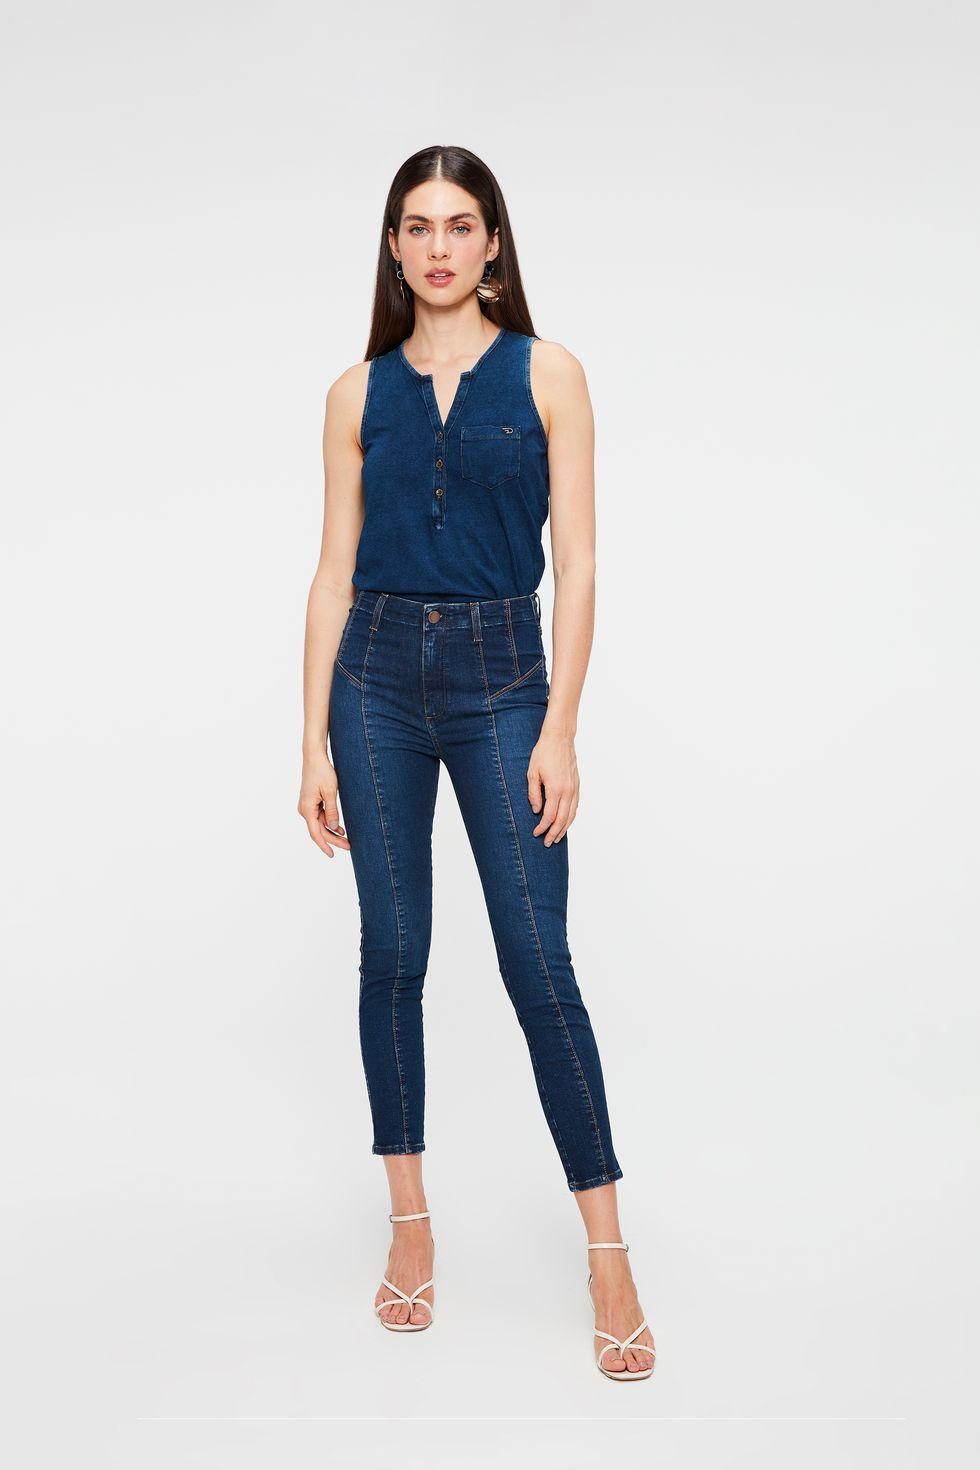 Calca-Jeans-Jegging-Cropped-com-Recortes-Frente--